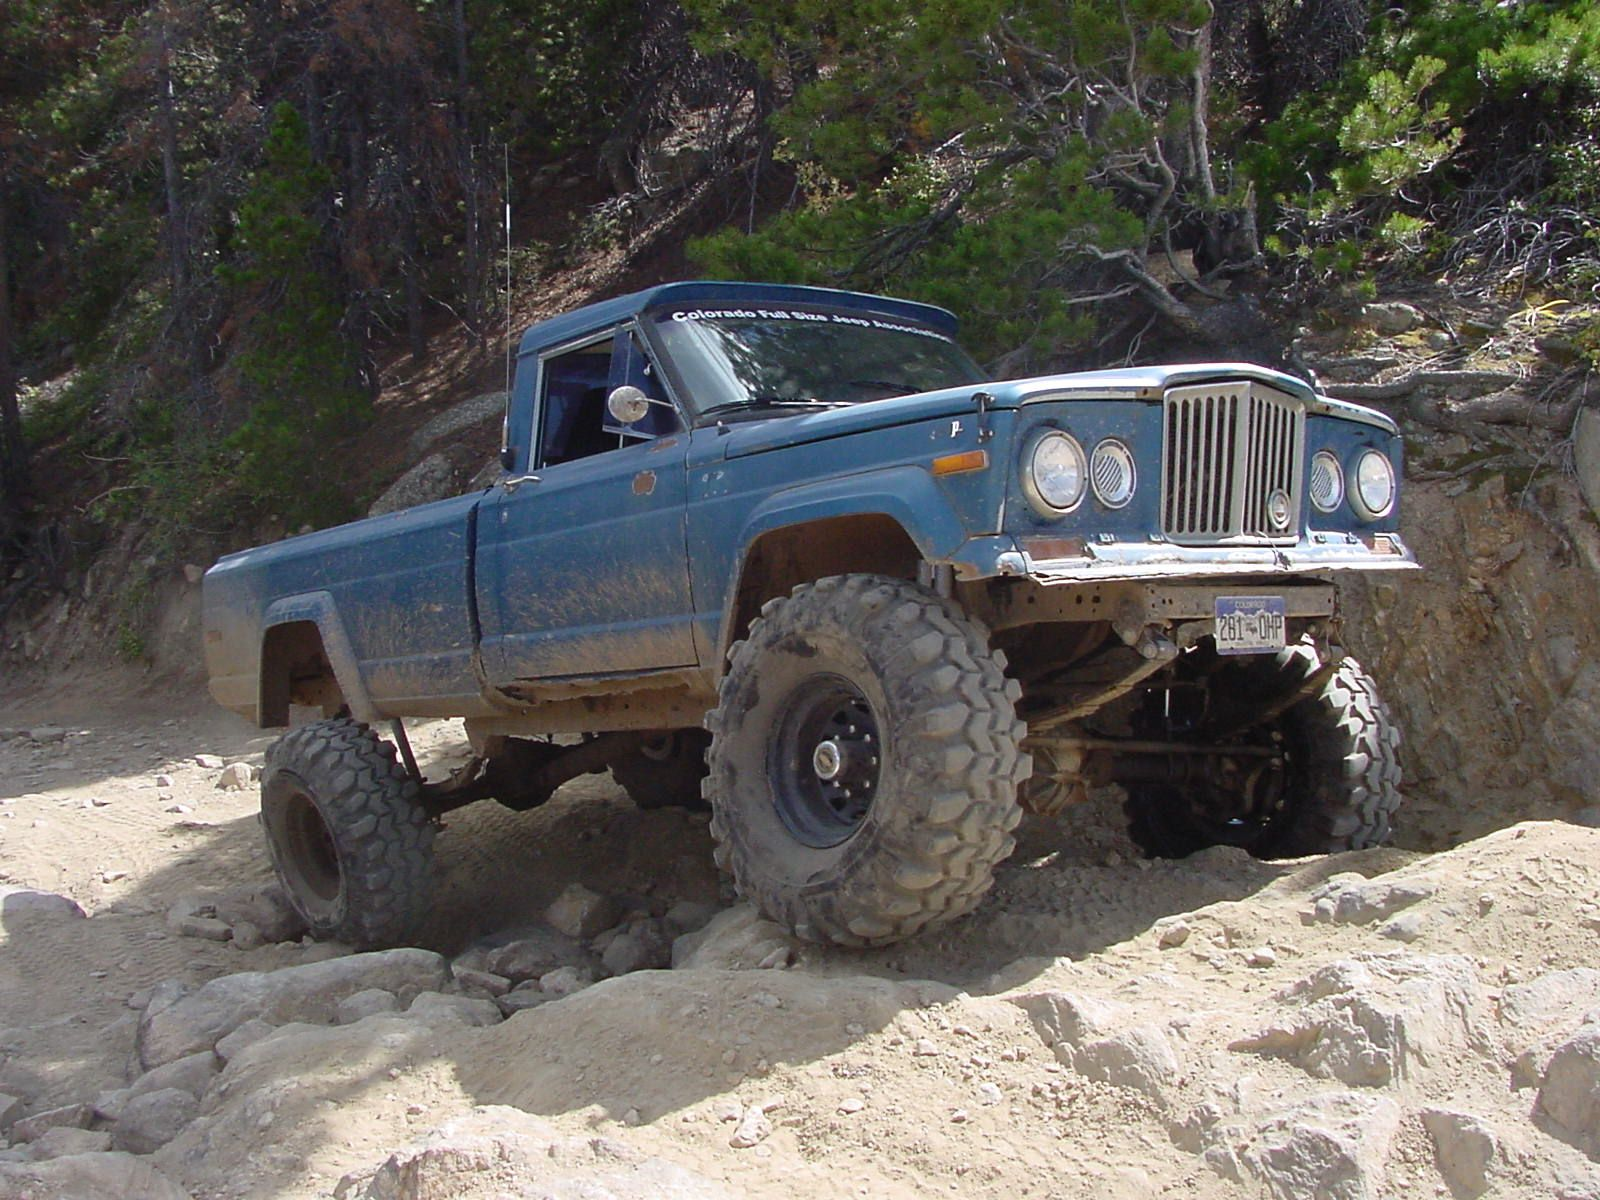 J10 Gladiator Jeep Truck Jeep Pickup Jeep Gladiator